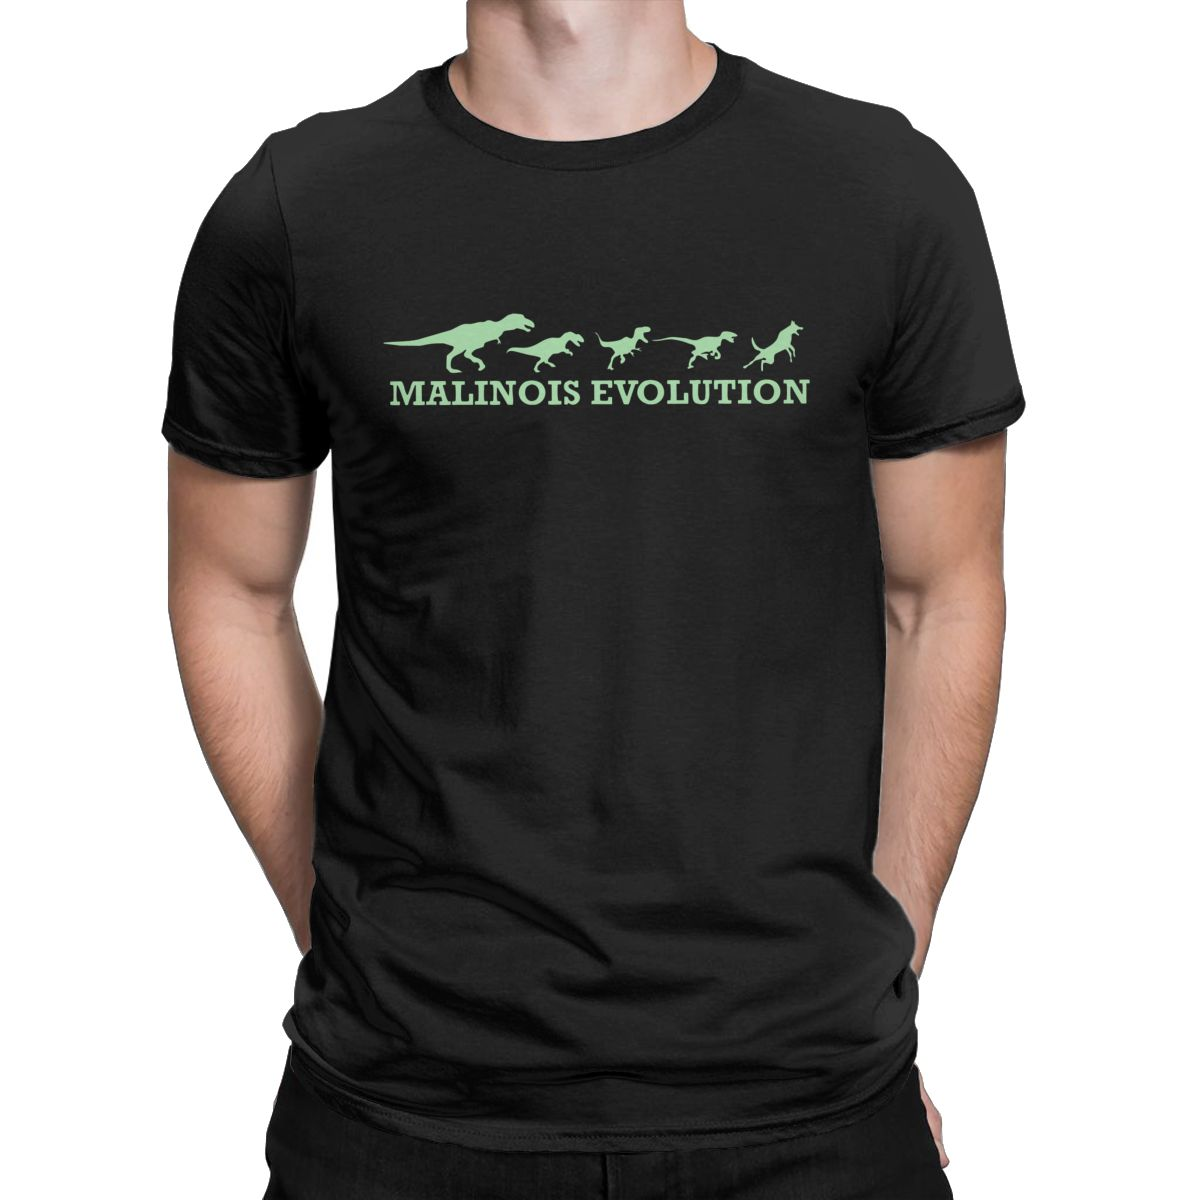 Malinois Evolution T Shirt Men 100% Cotton Vintage T-Shirts Crewneck Belgian Dog Tee Shirt Short Sleeve Tops Gift Idea